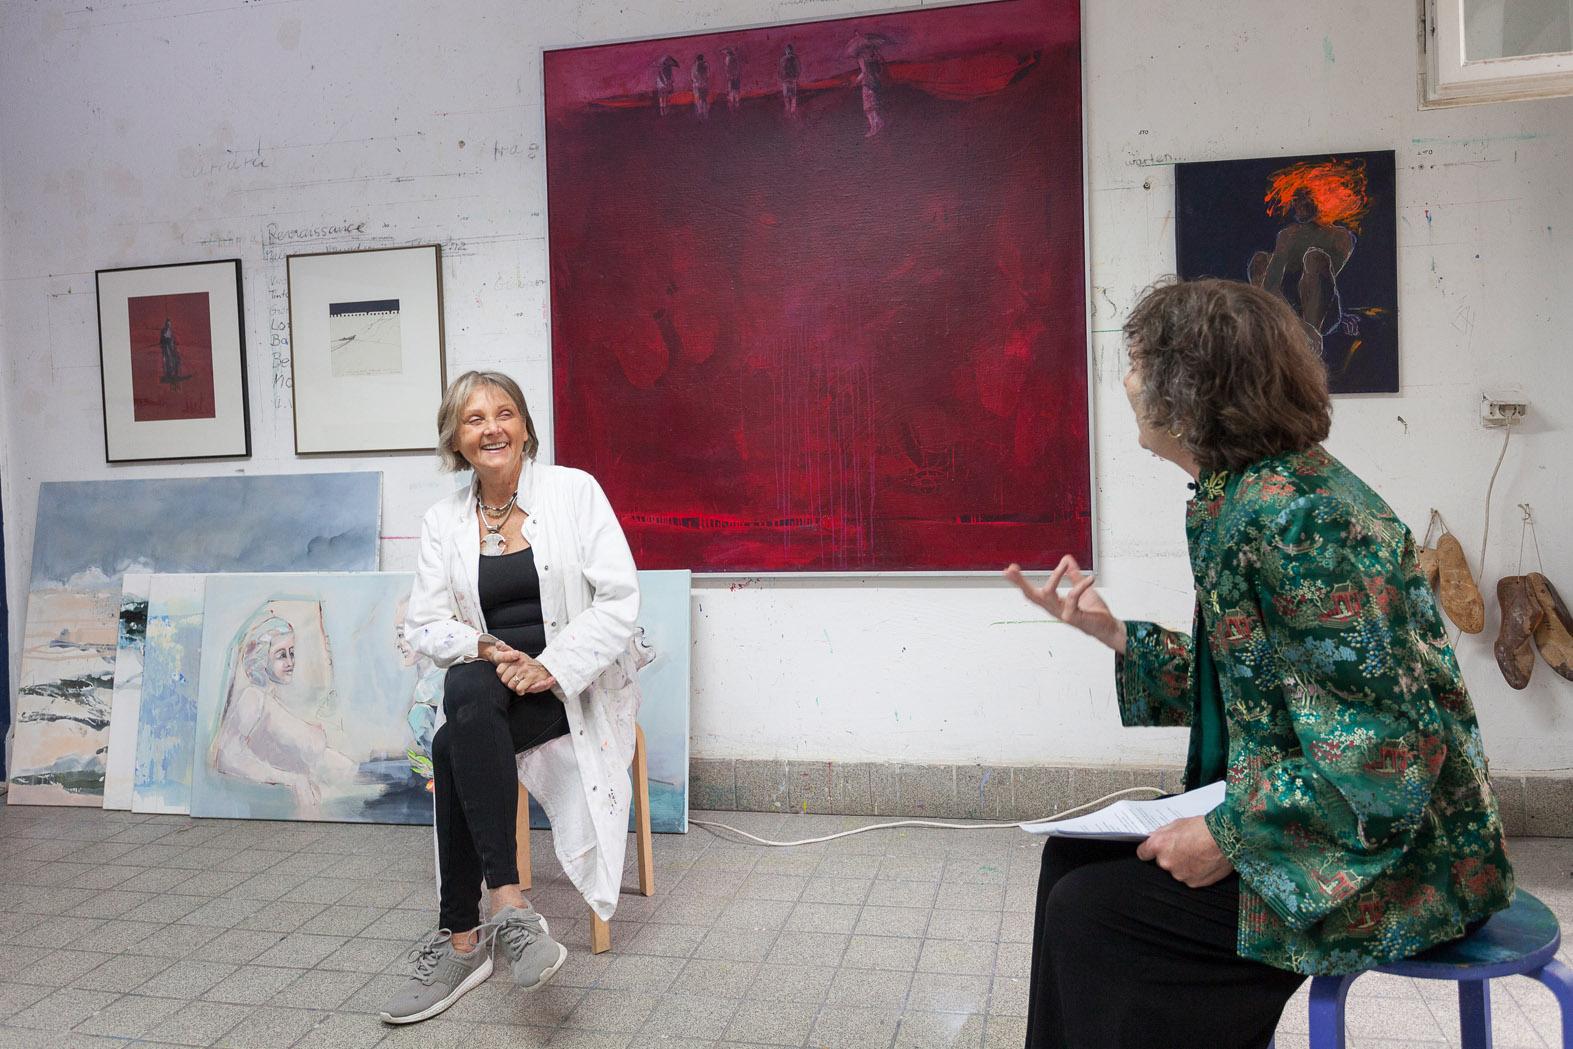 Atelierspaziergang mit Dr. Helen Adkins, Atelier Lörke